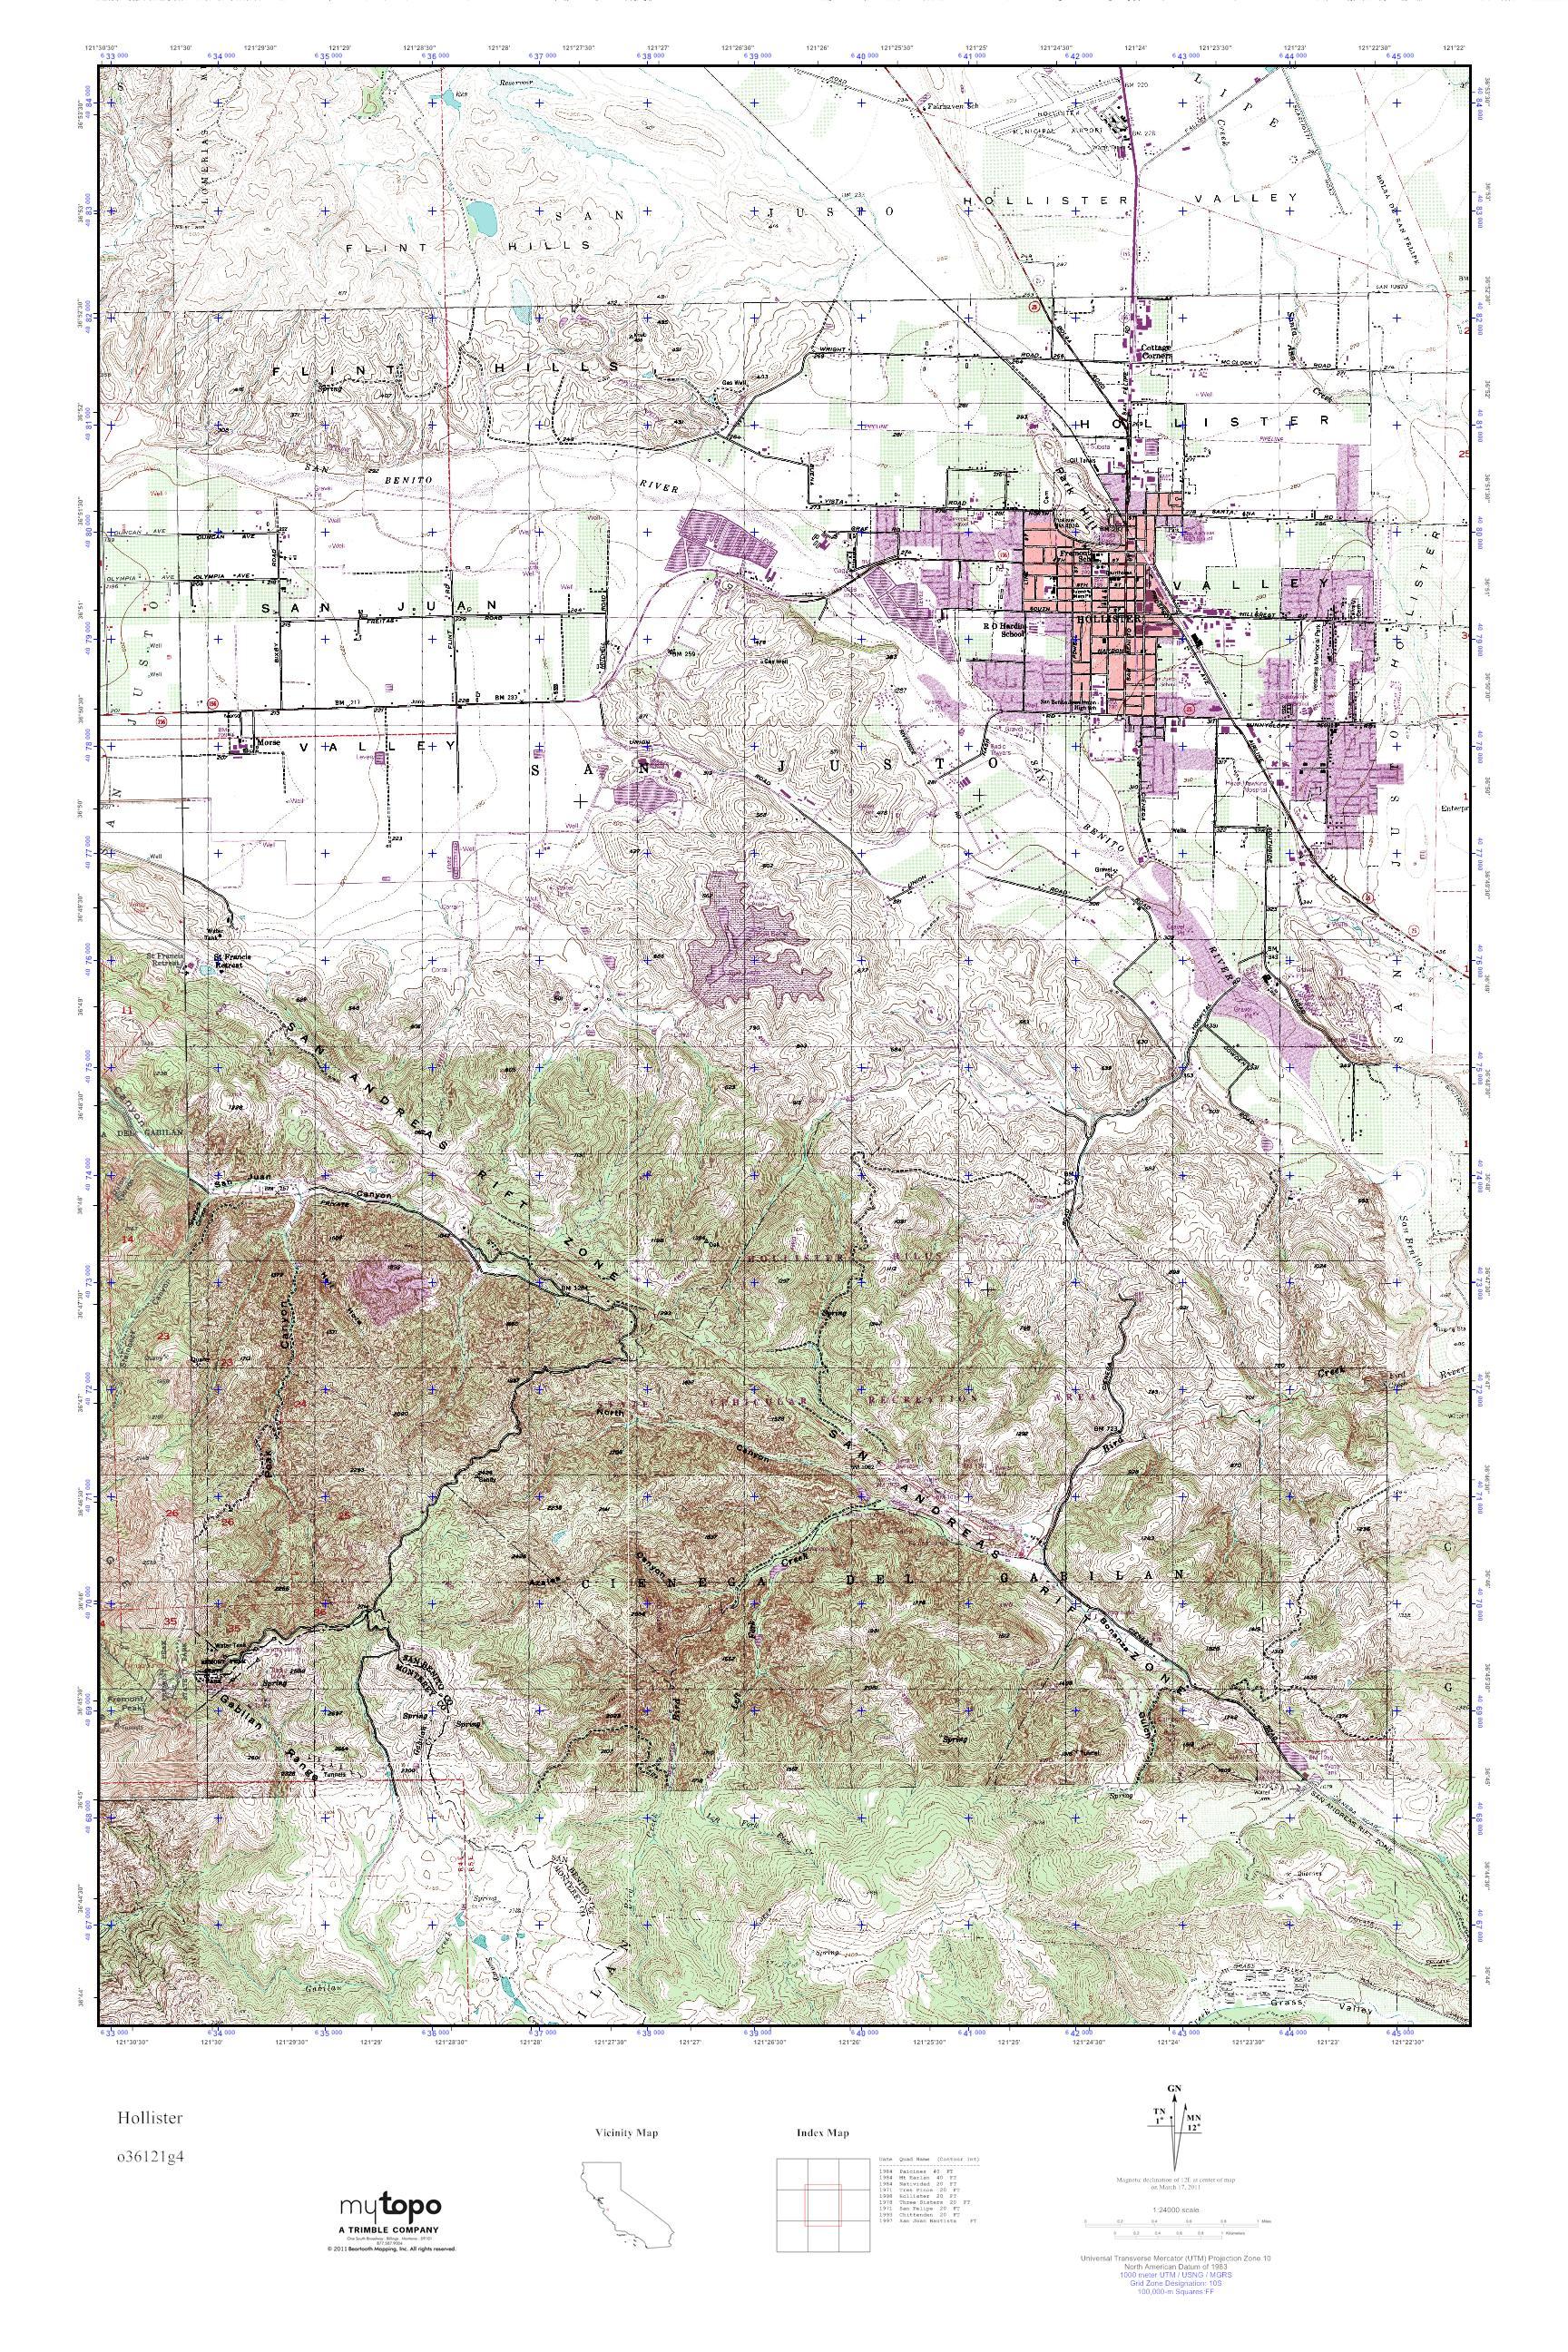 Mytopo Hollister California Usgs Quad Topo Map